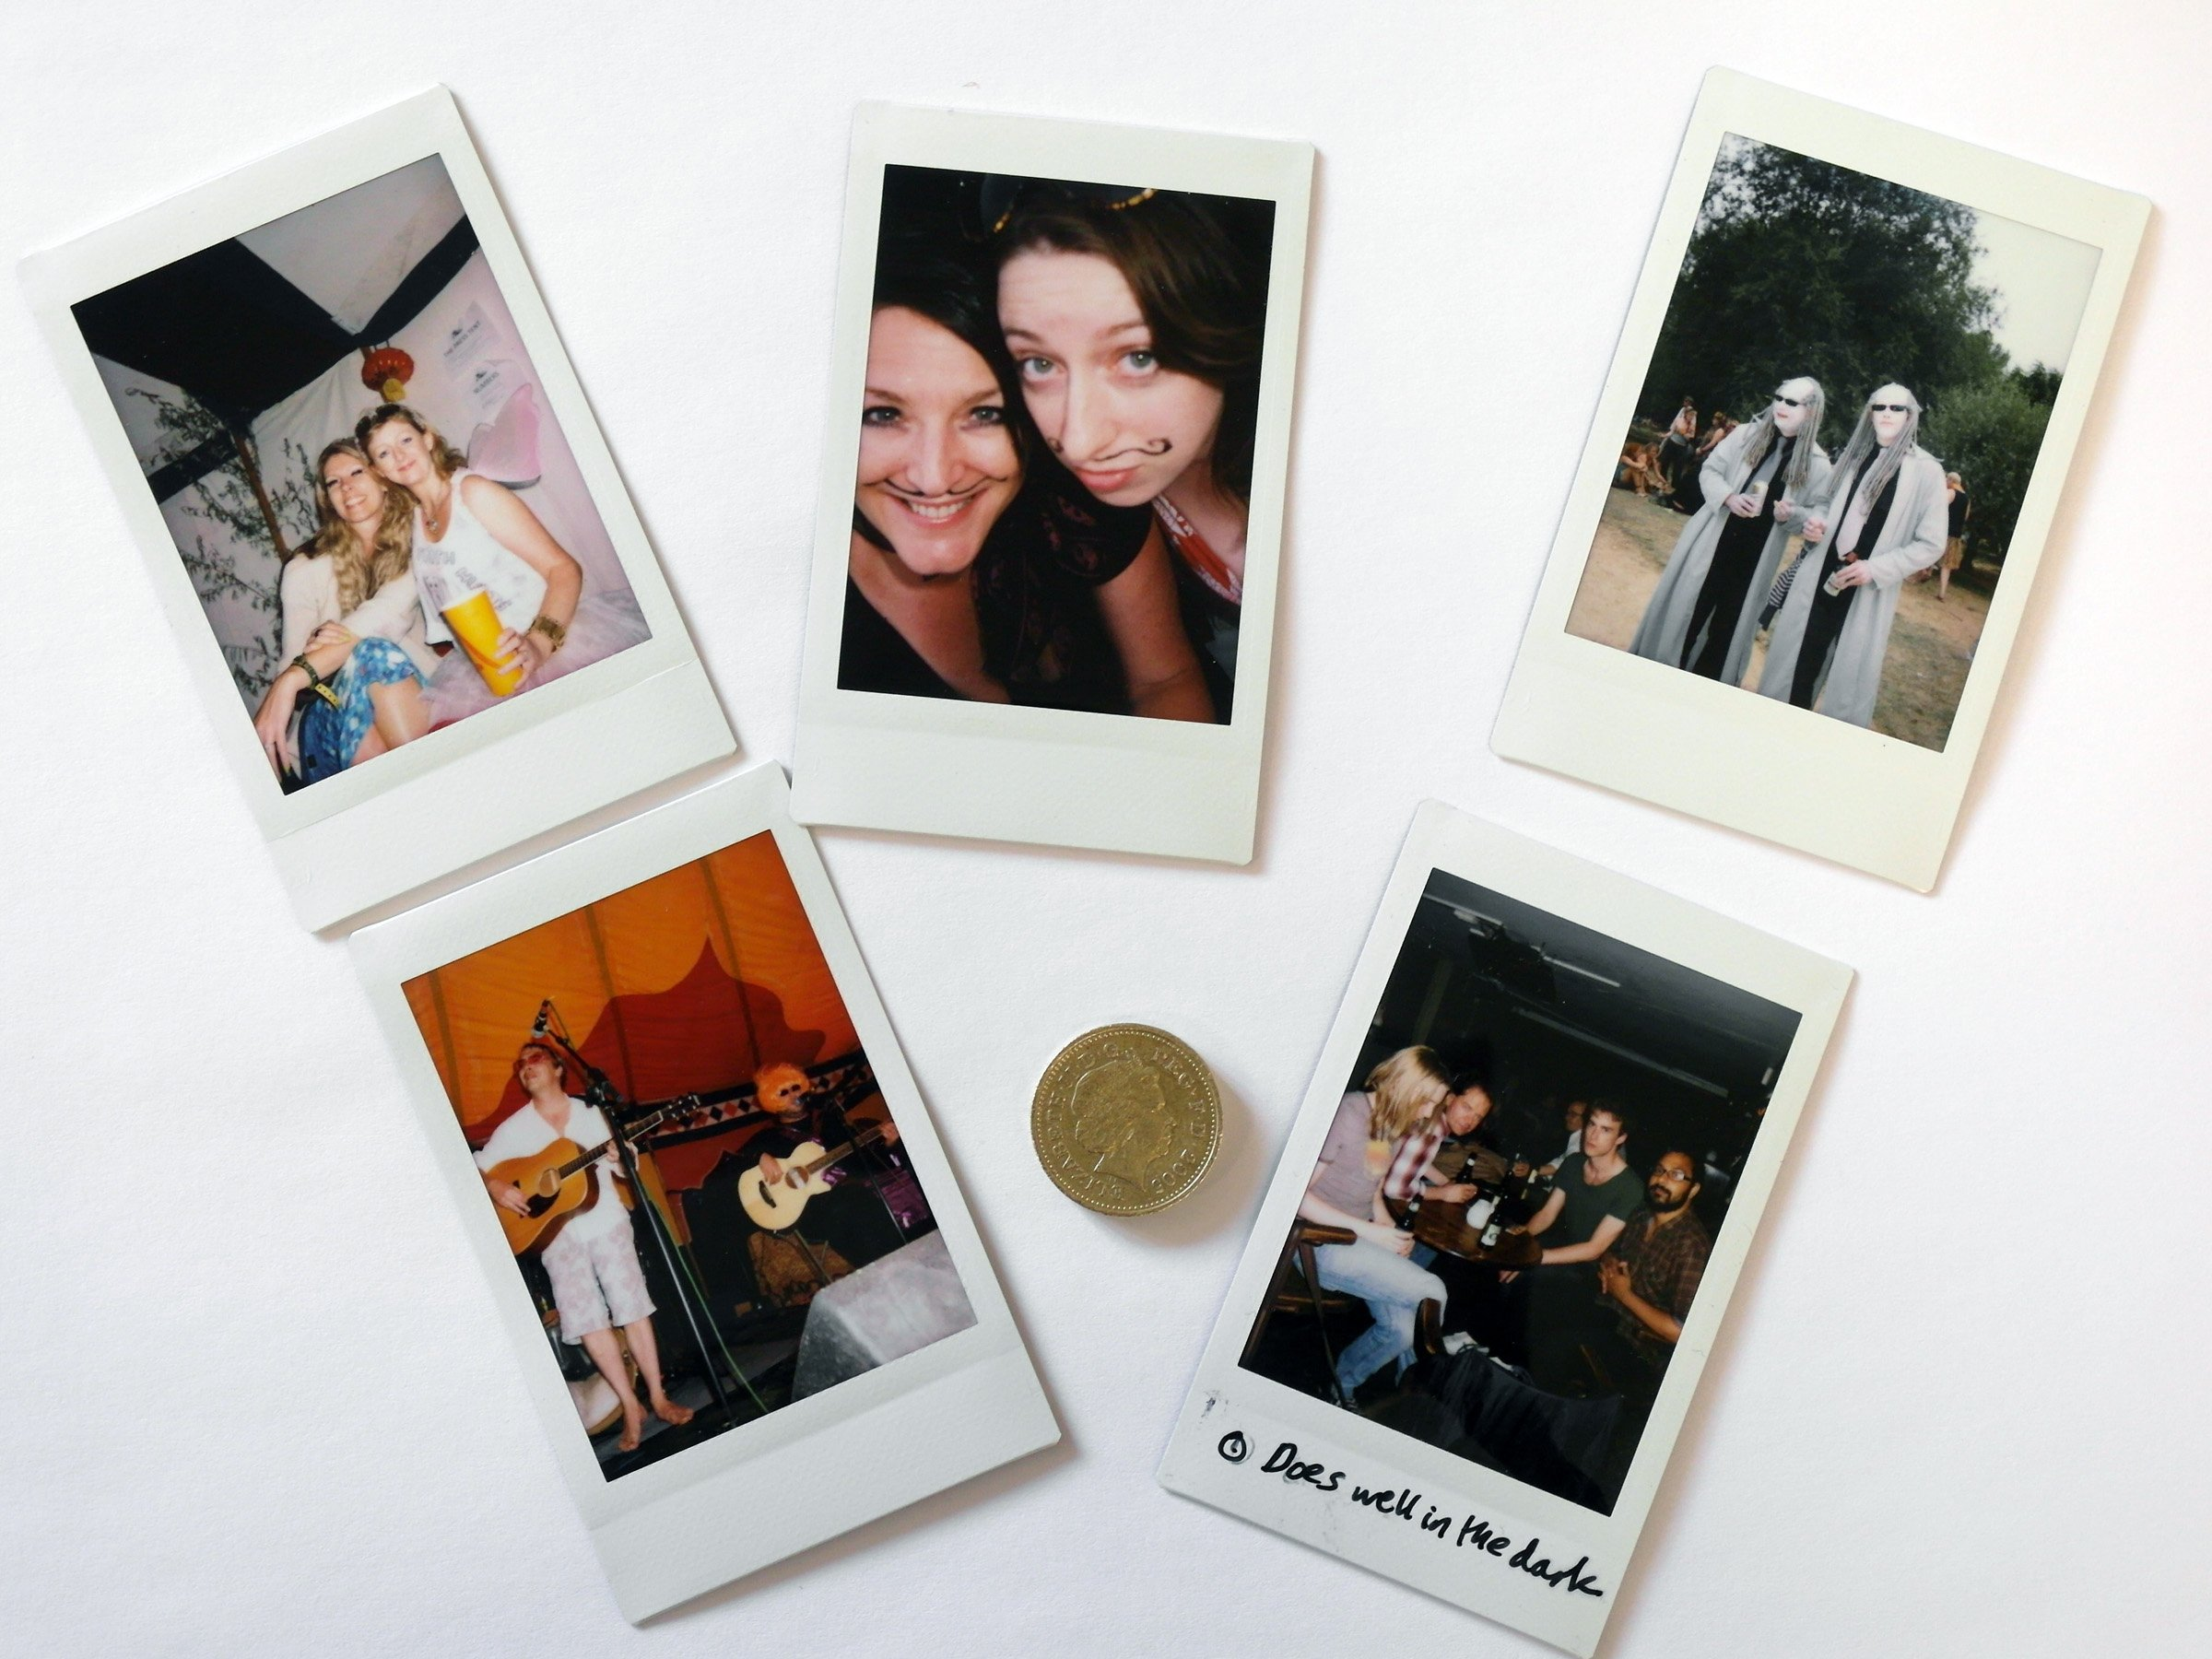 Change 2010 Style >> Polaroid 300 instant print camera • The Register